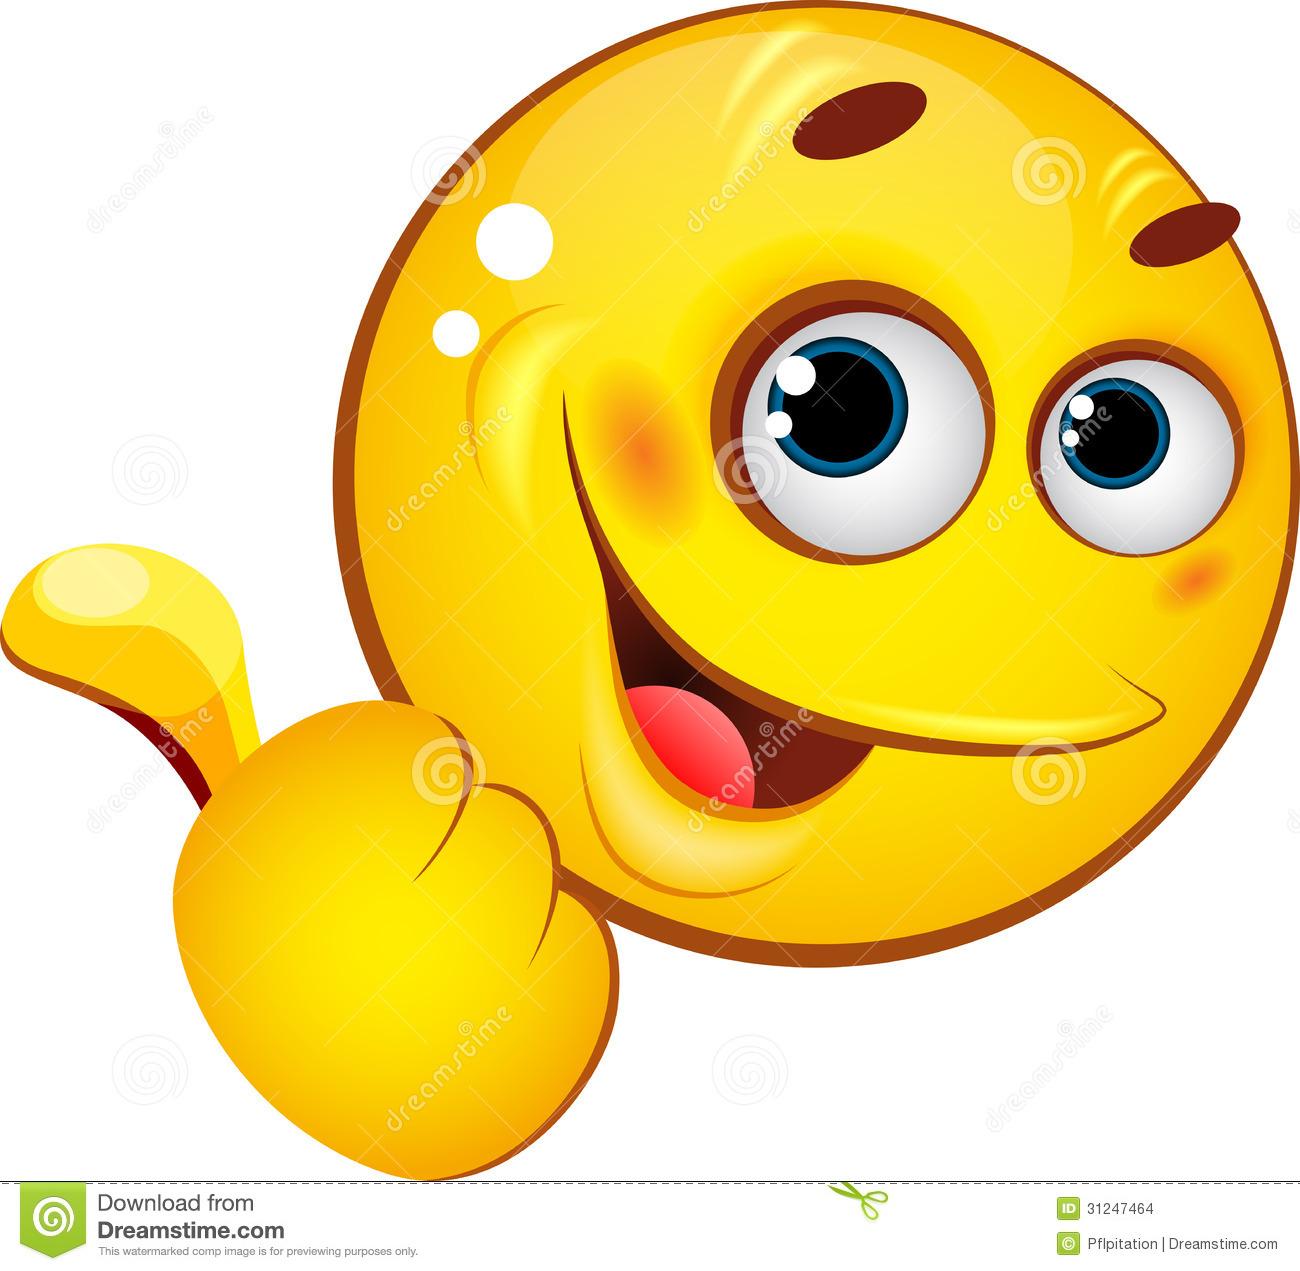 1300x1271 Thumbs Up Emoji Clipart Amp Thumbs Up Emoji Clip Art Images